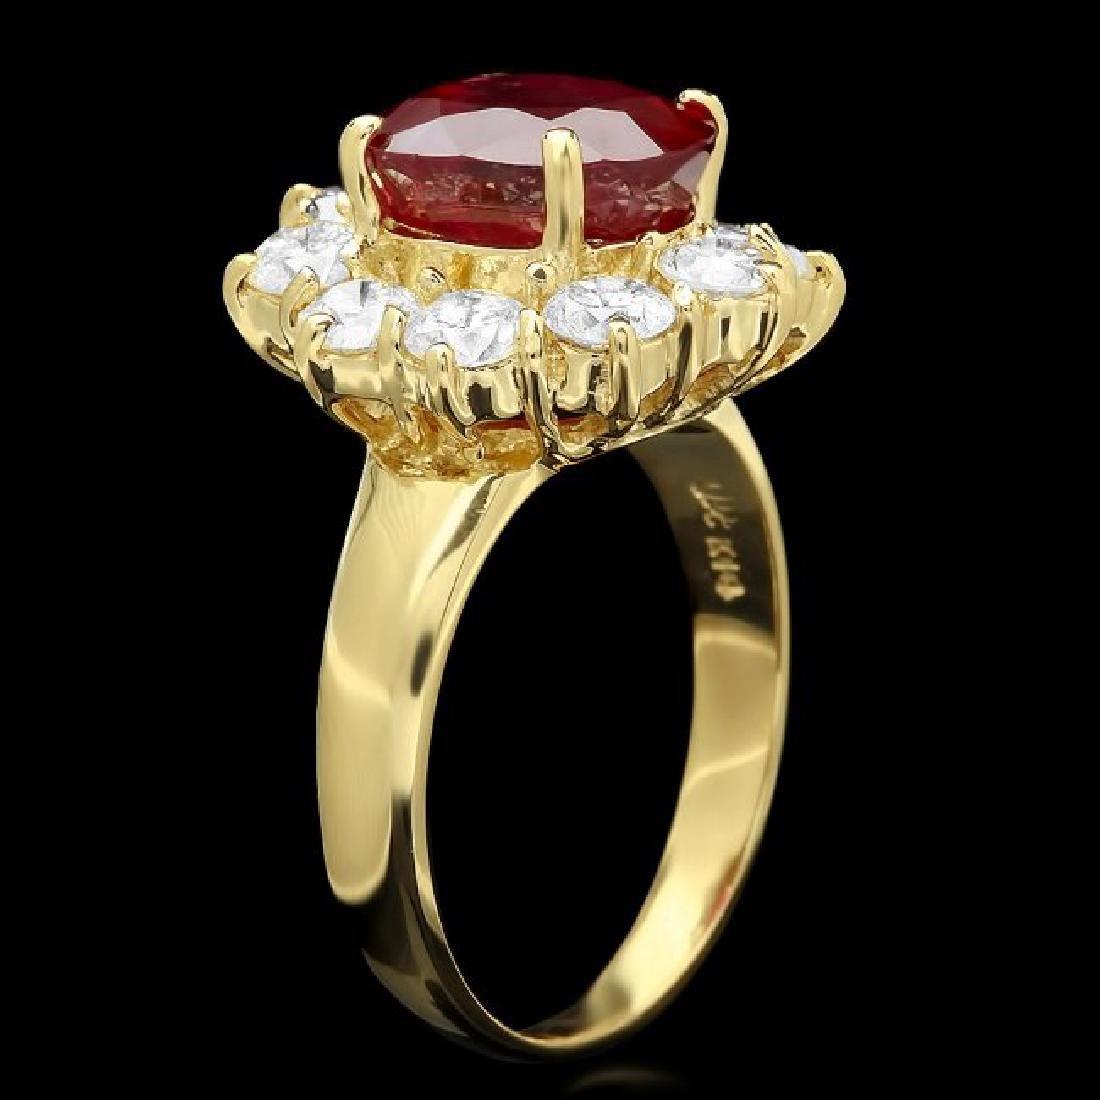 14k Yellow Gold 4.66ct Ruby 1.74ct Diamond Ring - 2